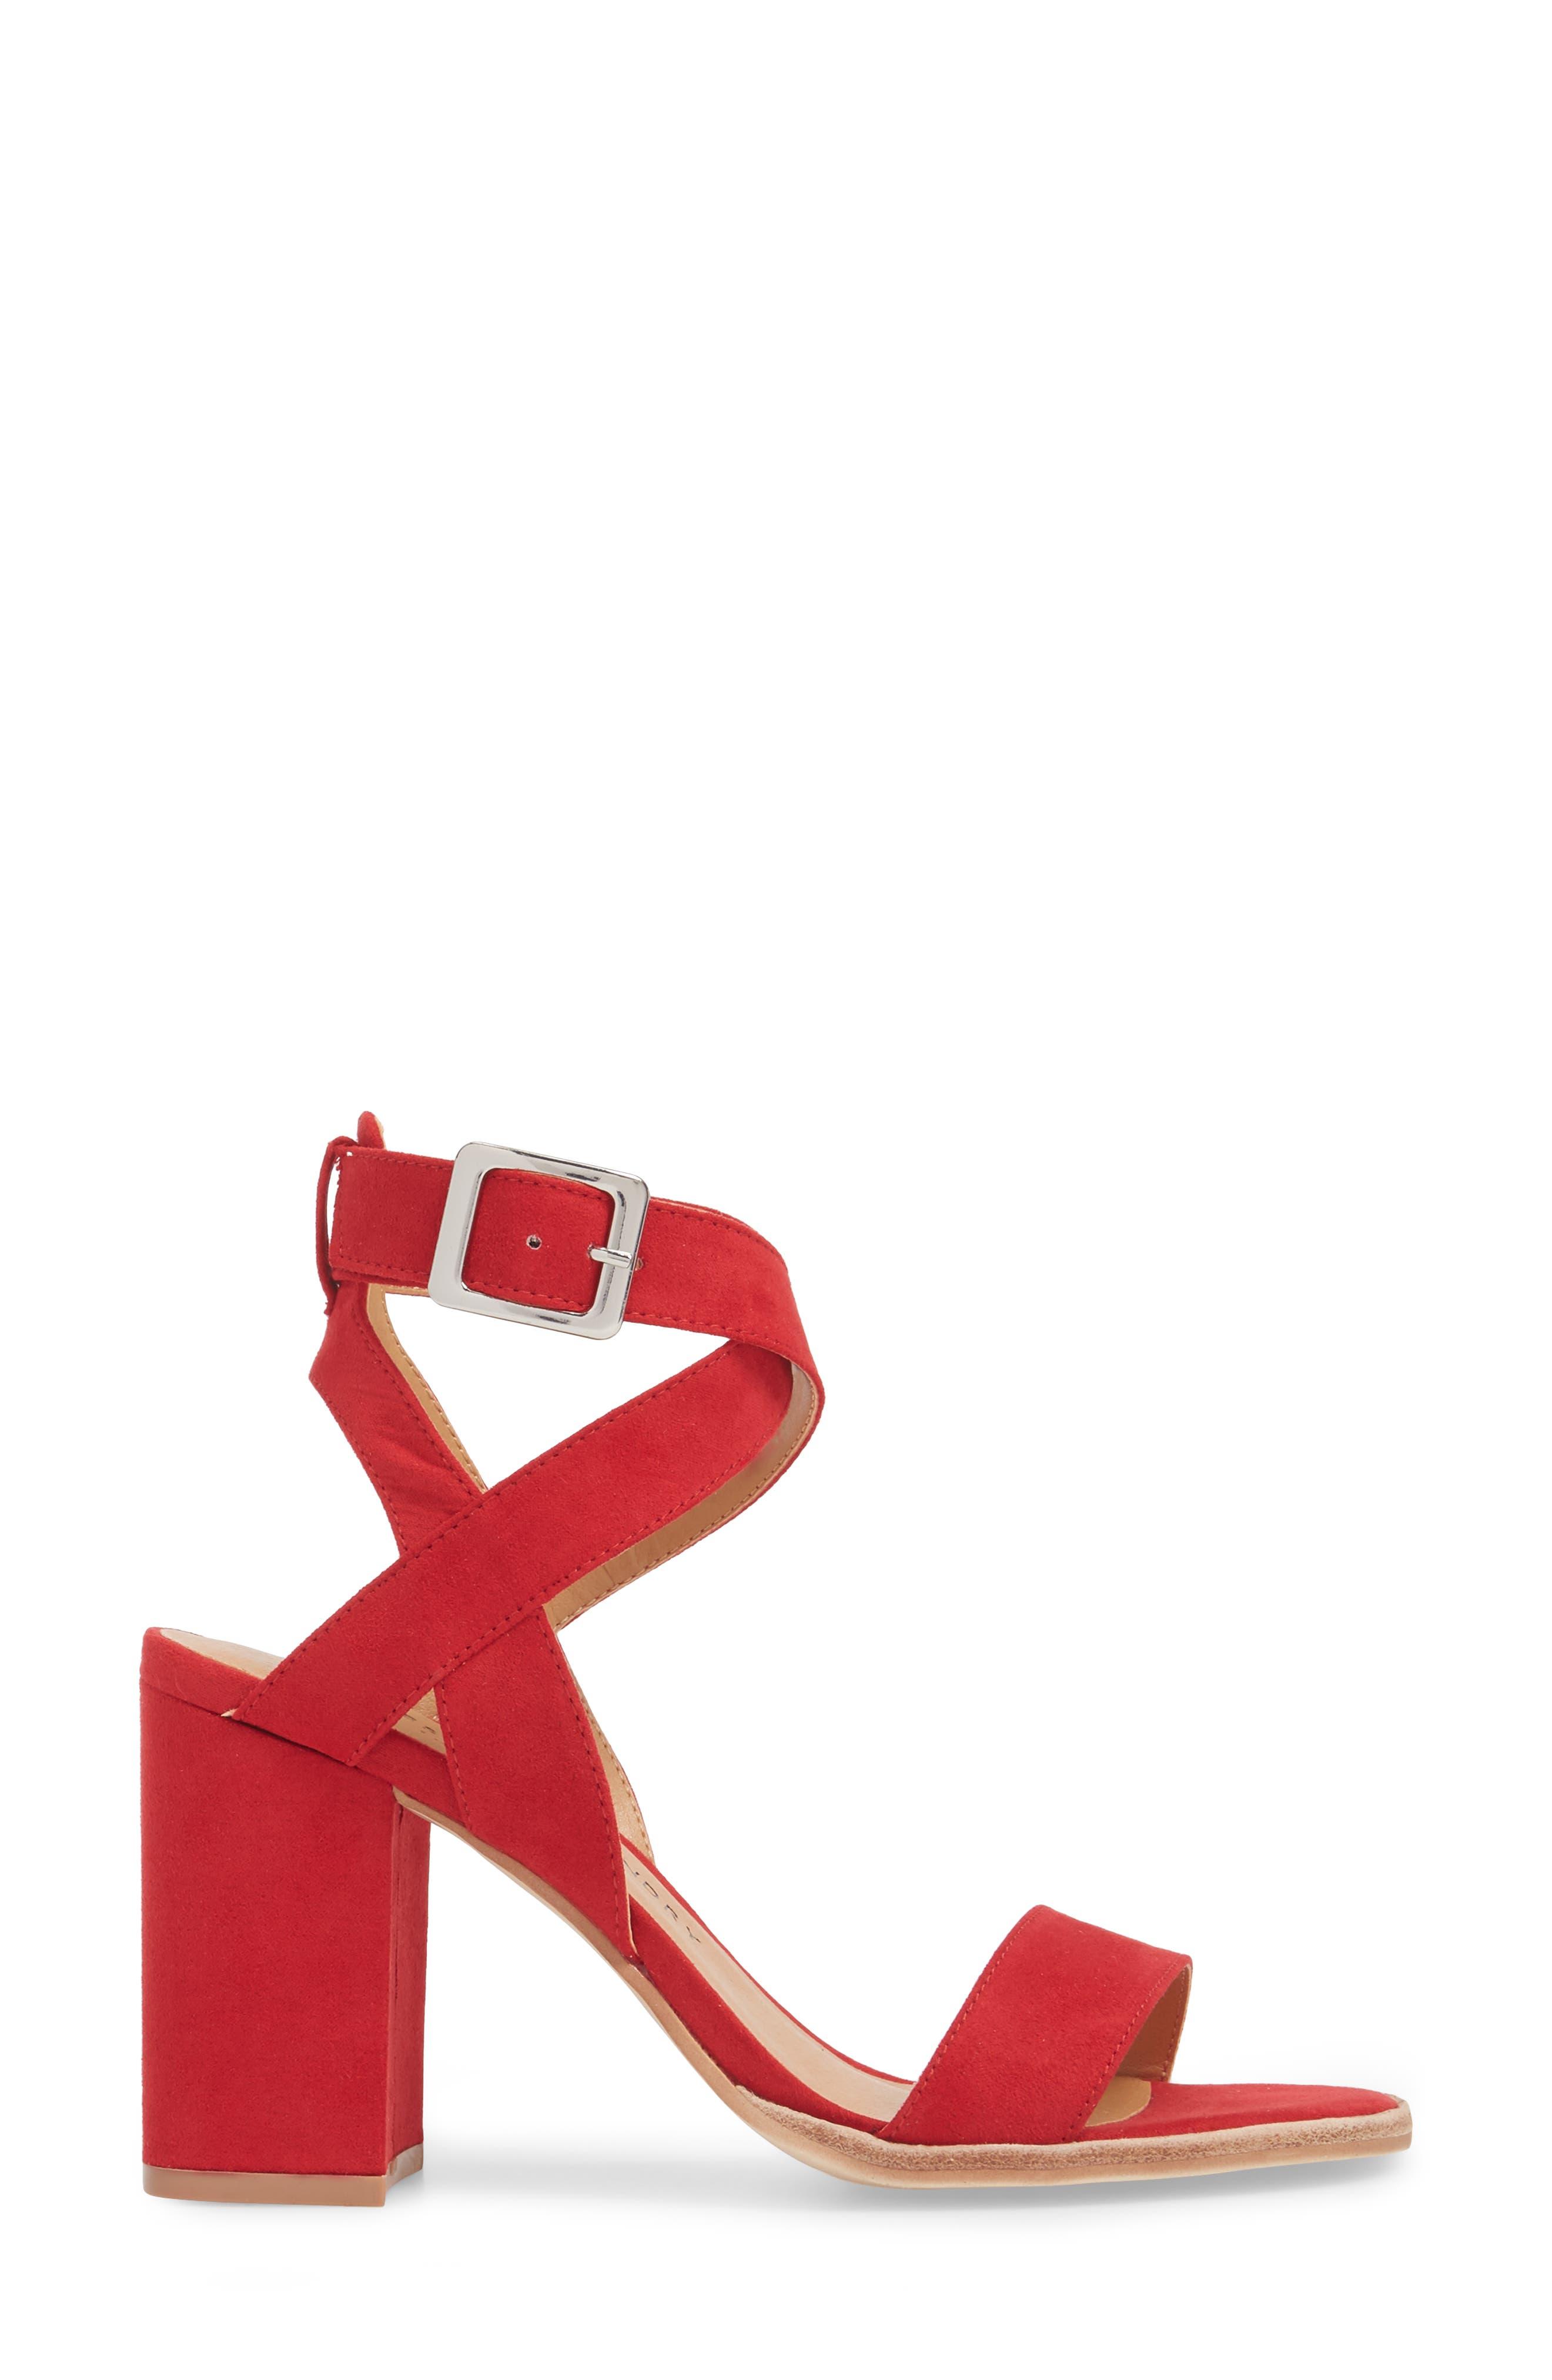 Stassi Block Heel Sandal,                             Alternate thumbnail 3, color,                             Red